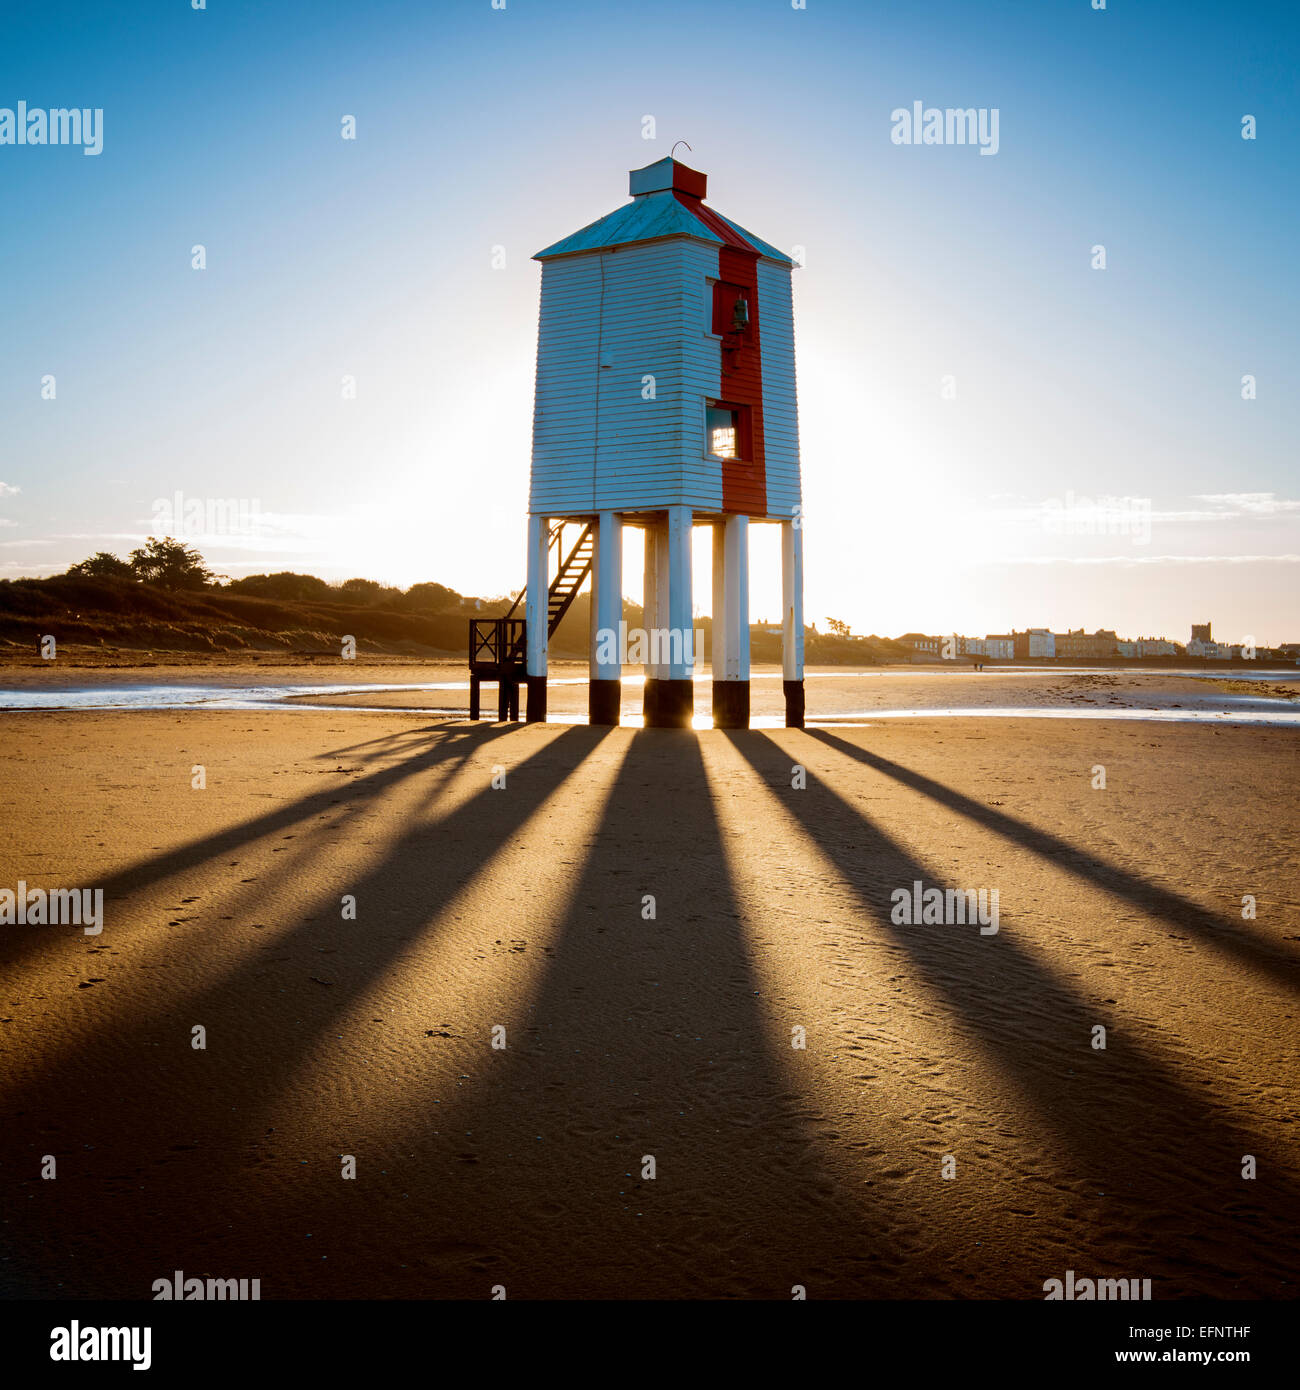 Burnham-on-sea lighthouse, Somerset - Stock Image